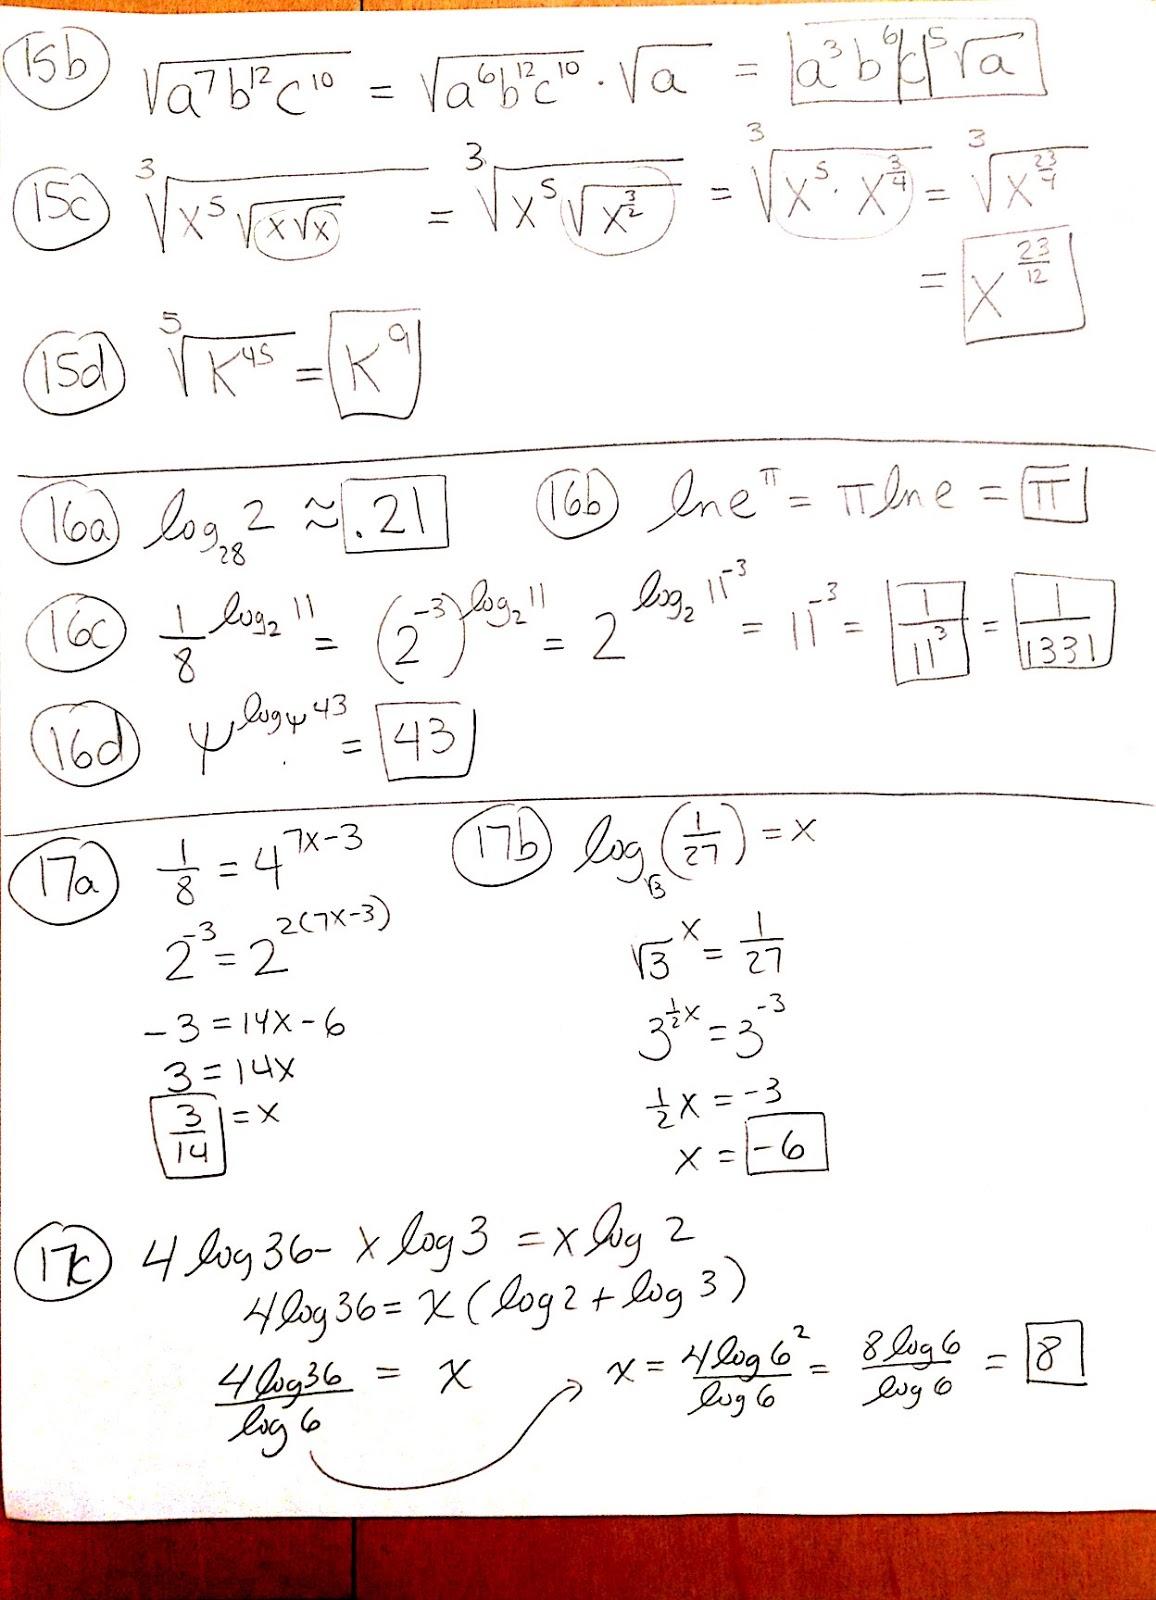 Do my precalculus homework